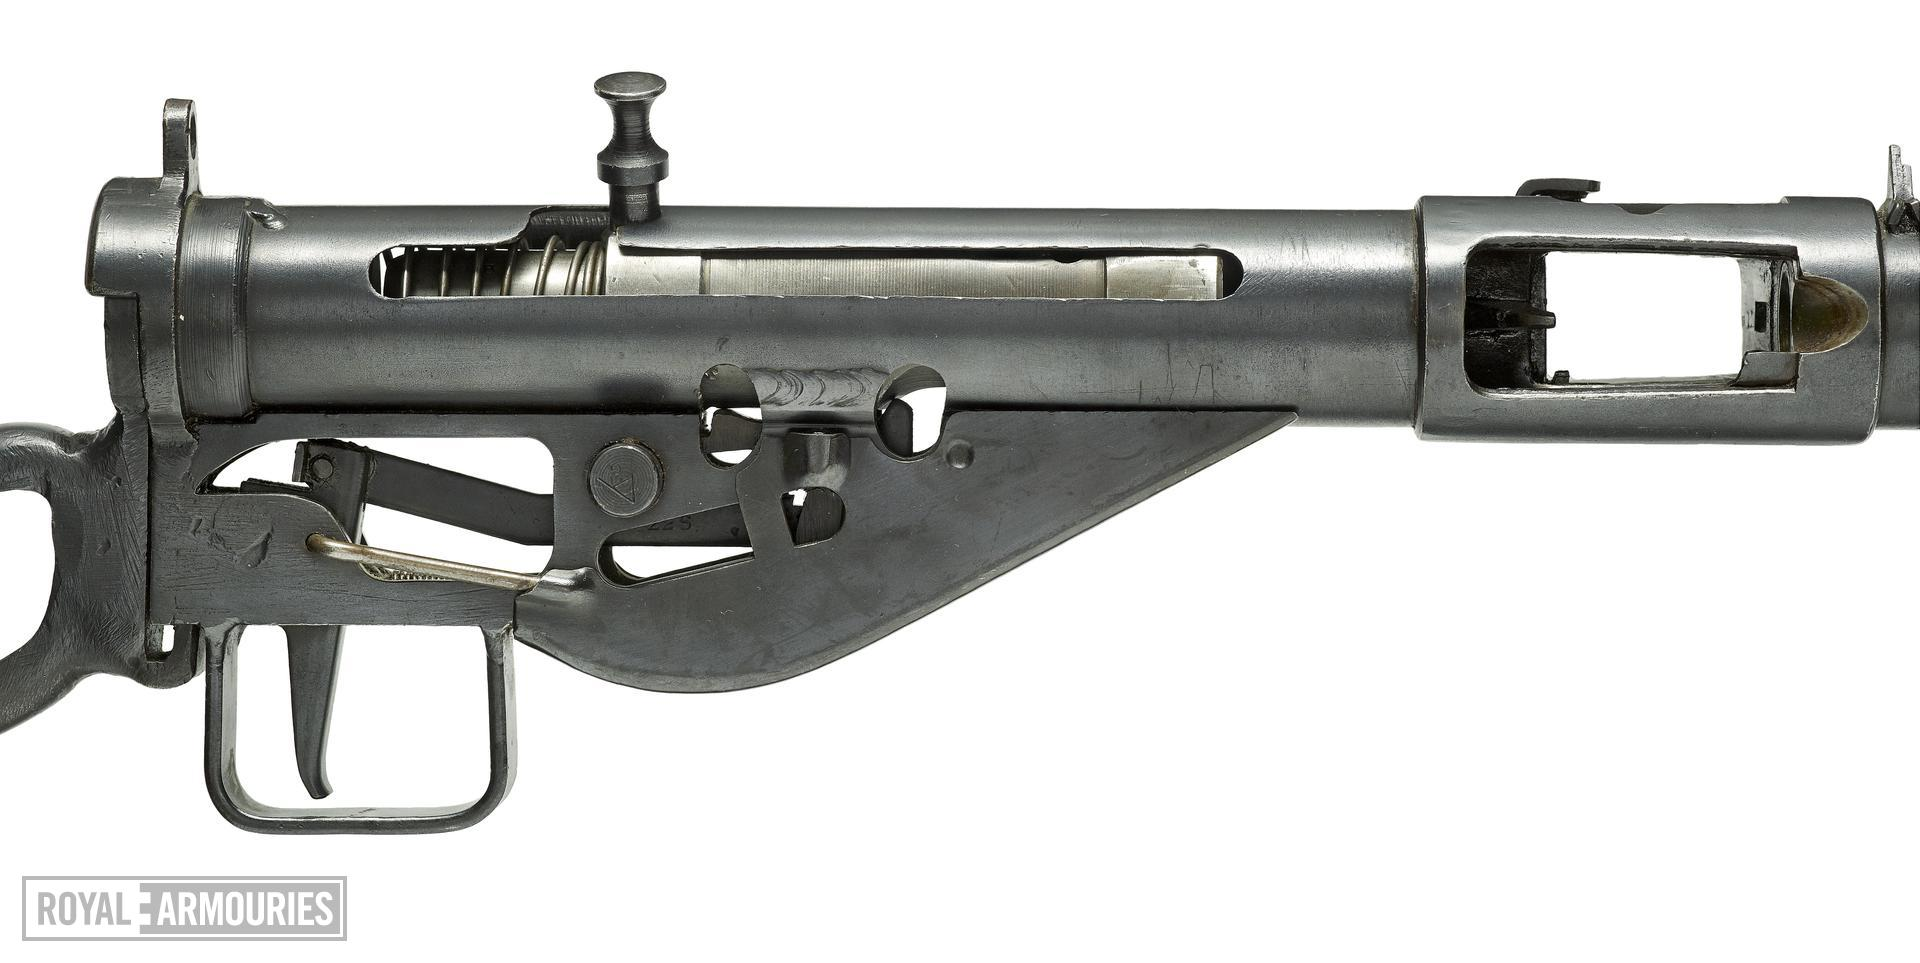 Centrefire automatic submachine gun - Sten Mk.II Skeleton